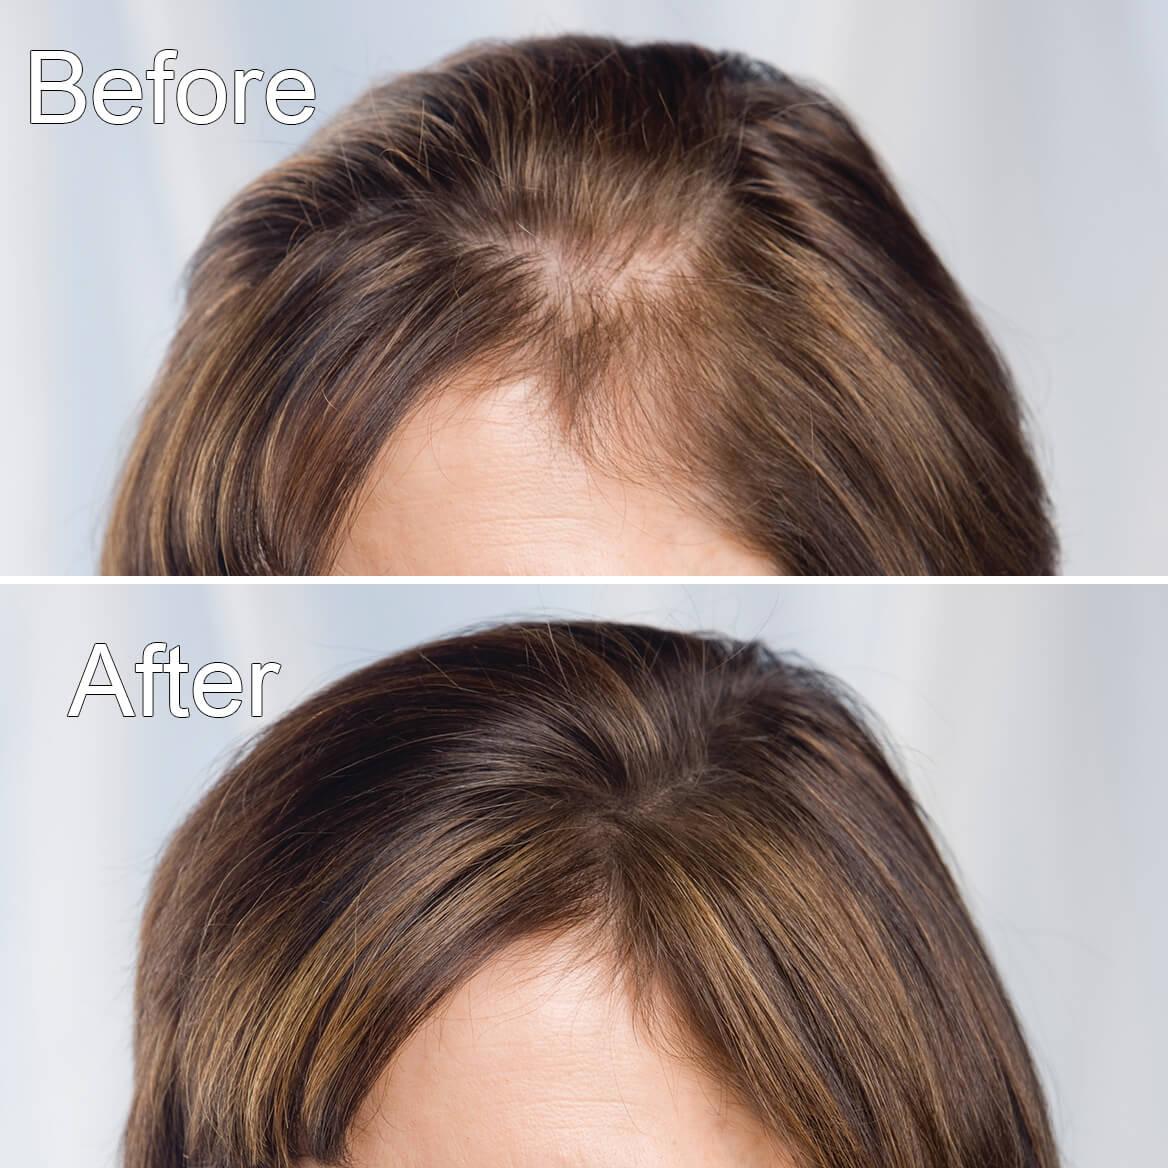 Joan Rivers Great Hair Day Brunette 2-Pack-367944